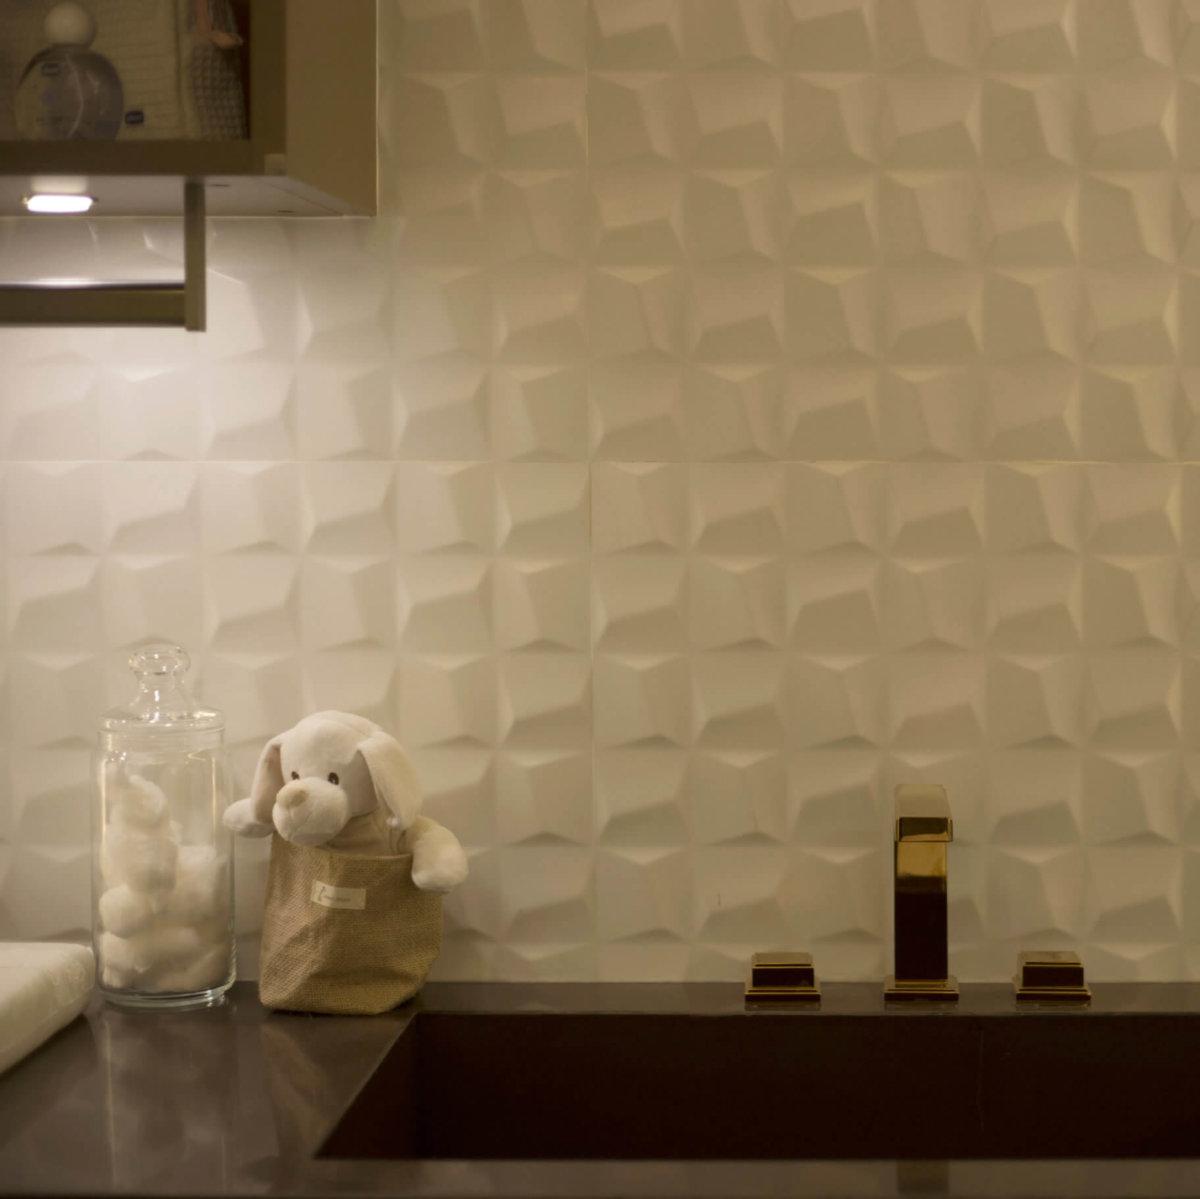 Eli Cubic White AC 450x900mm_Stiles_Lifestyle2_Image